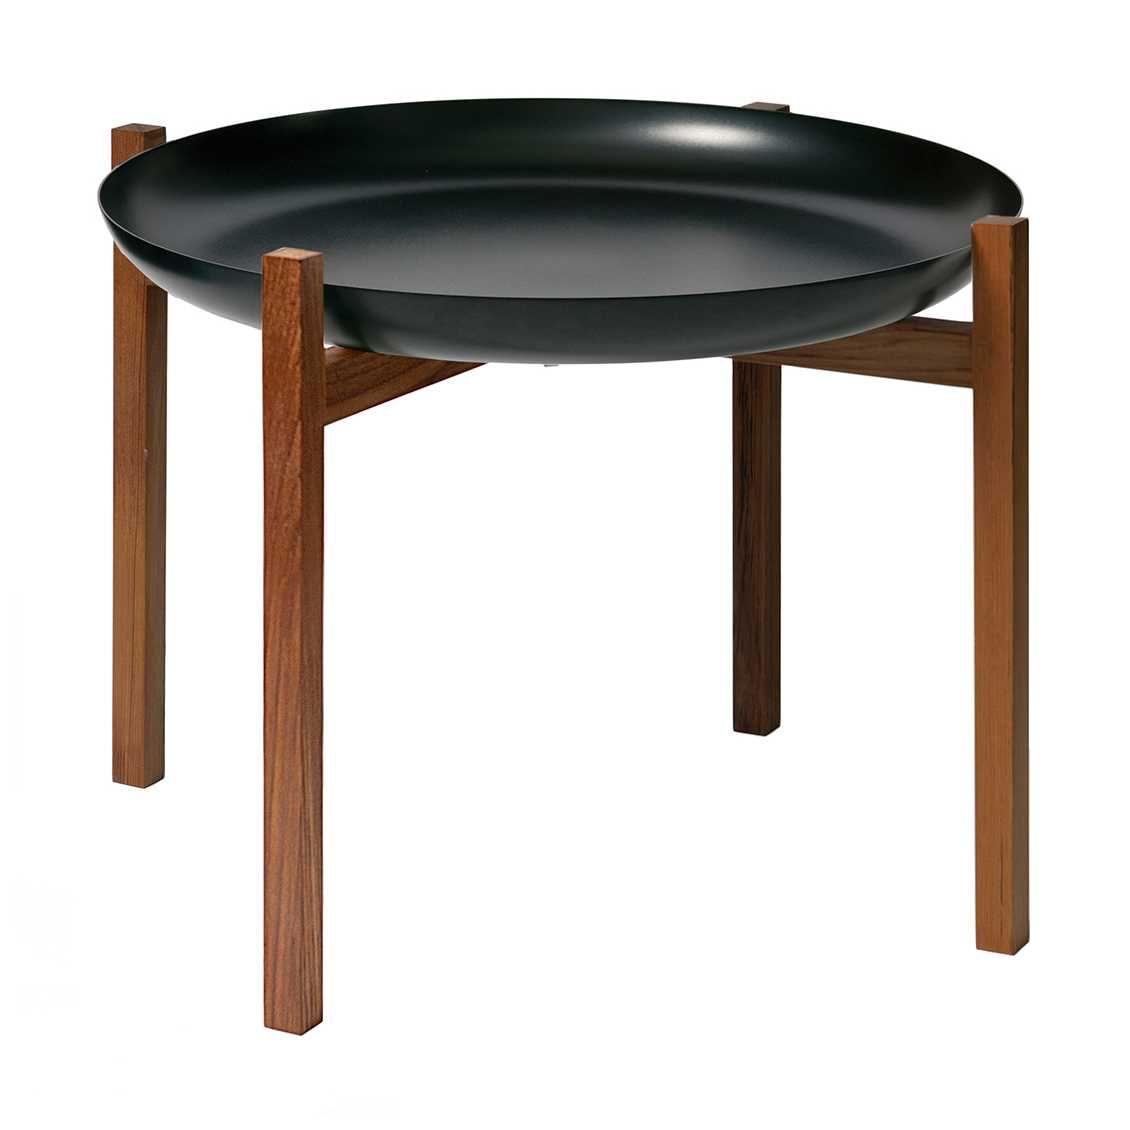 design-house-stockholm-tablo-salontafel-zwart-teak-1088_1000_1089_9400.jpg (1130×1130)